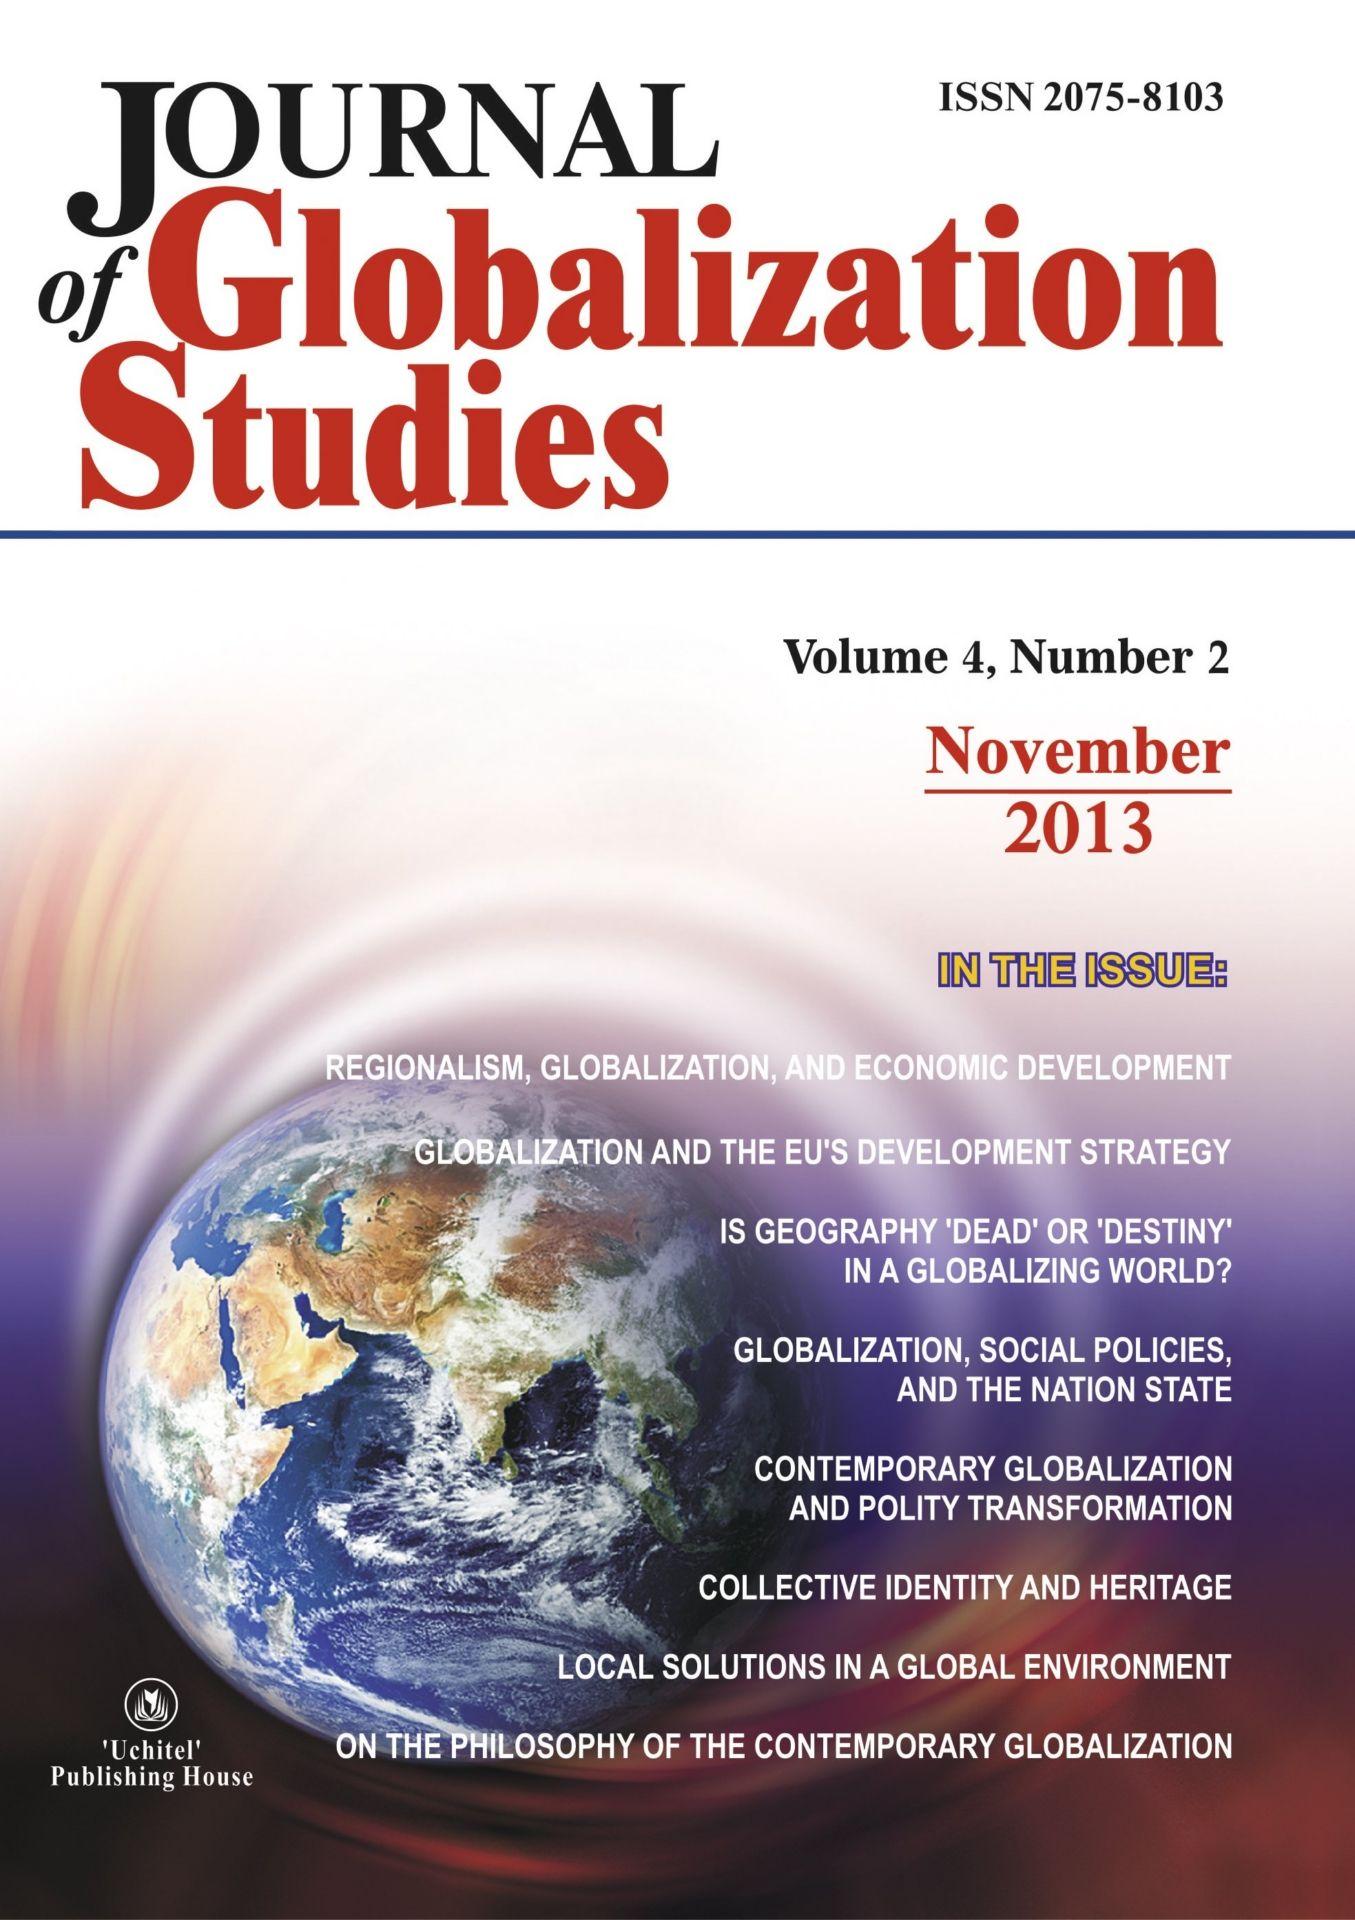 Journal of Globalization Studies Volume 4, Number 2, 2013 г. Журнал глобализационных исследований Международный журнал на английском языке